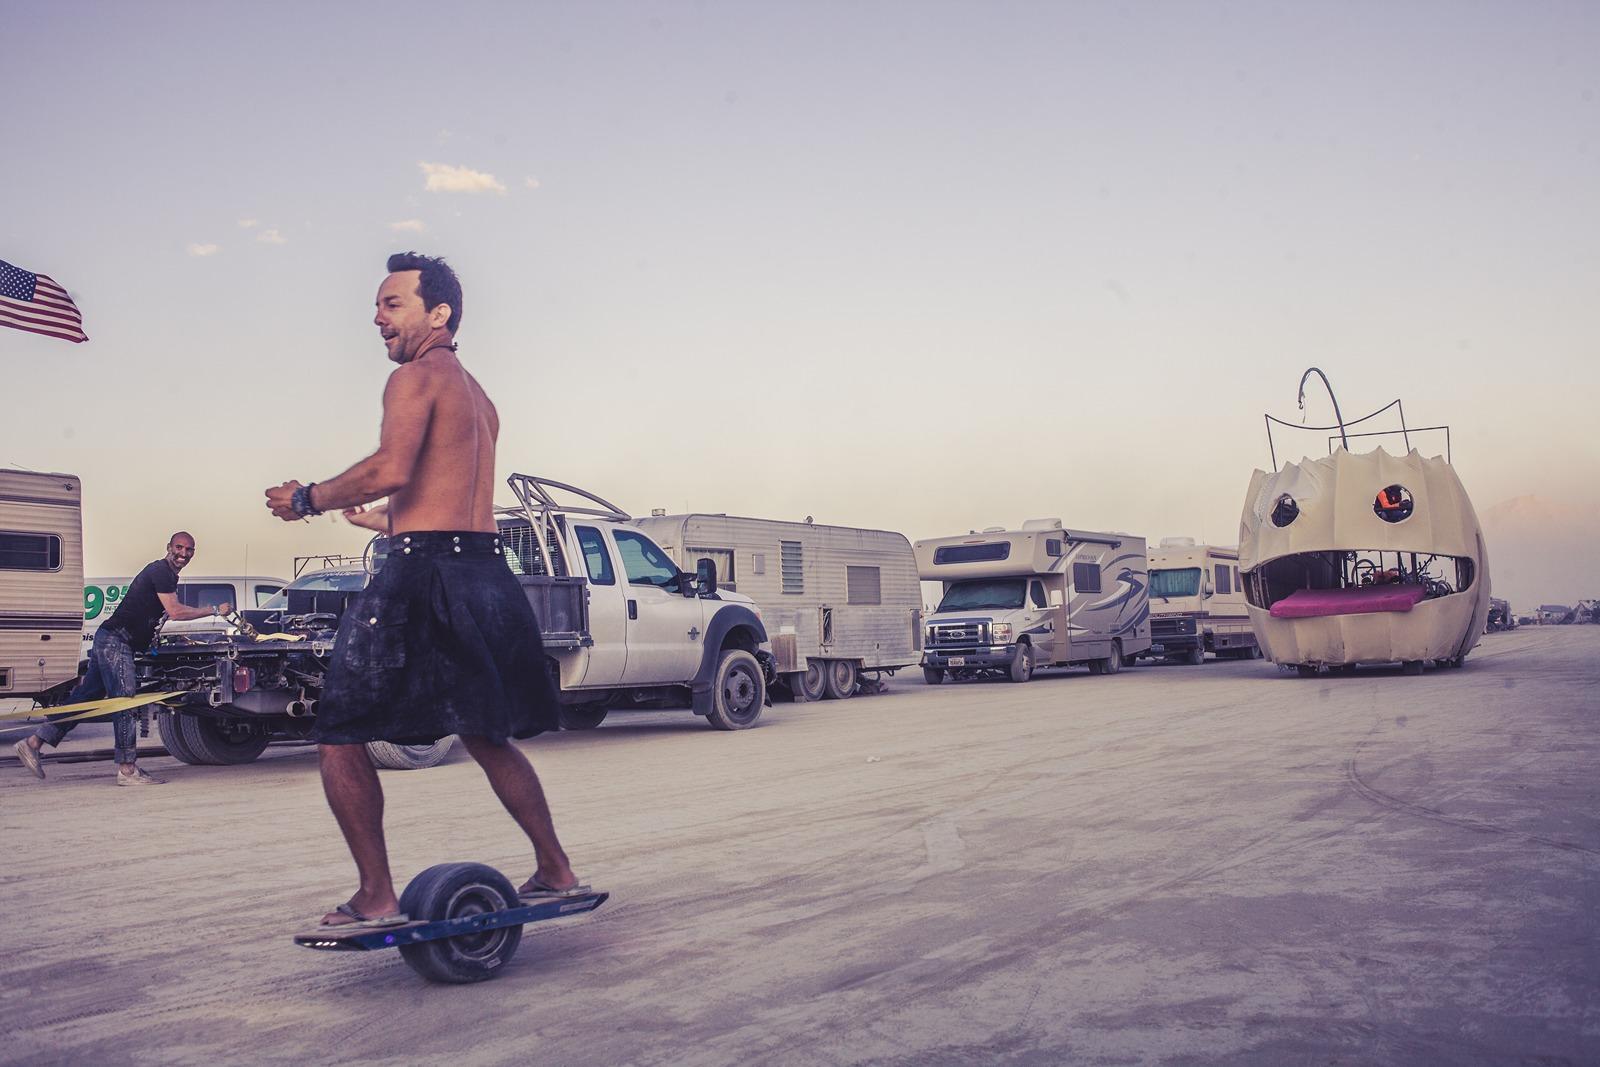 Burning Man - One wheel skateboard